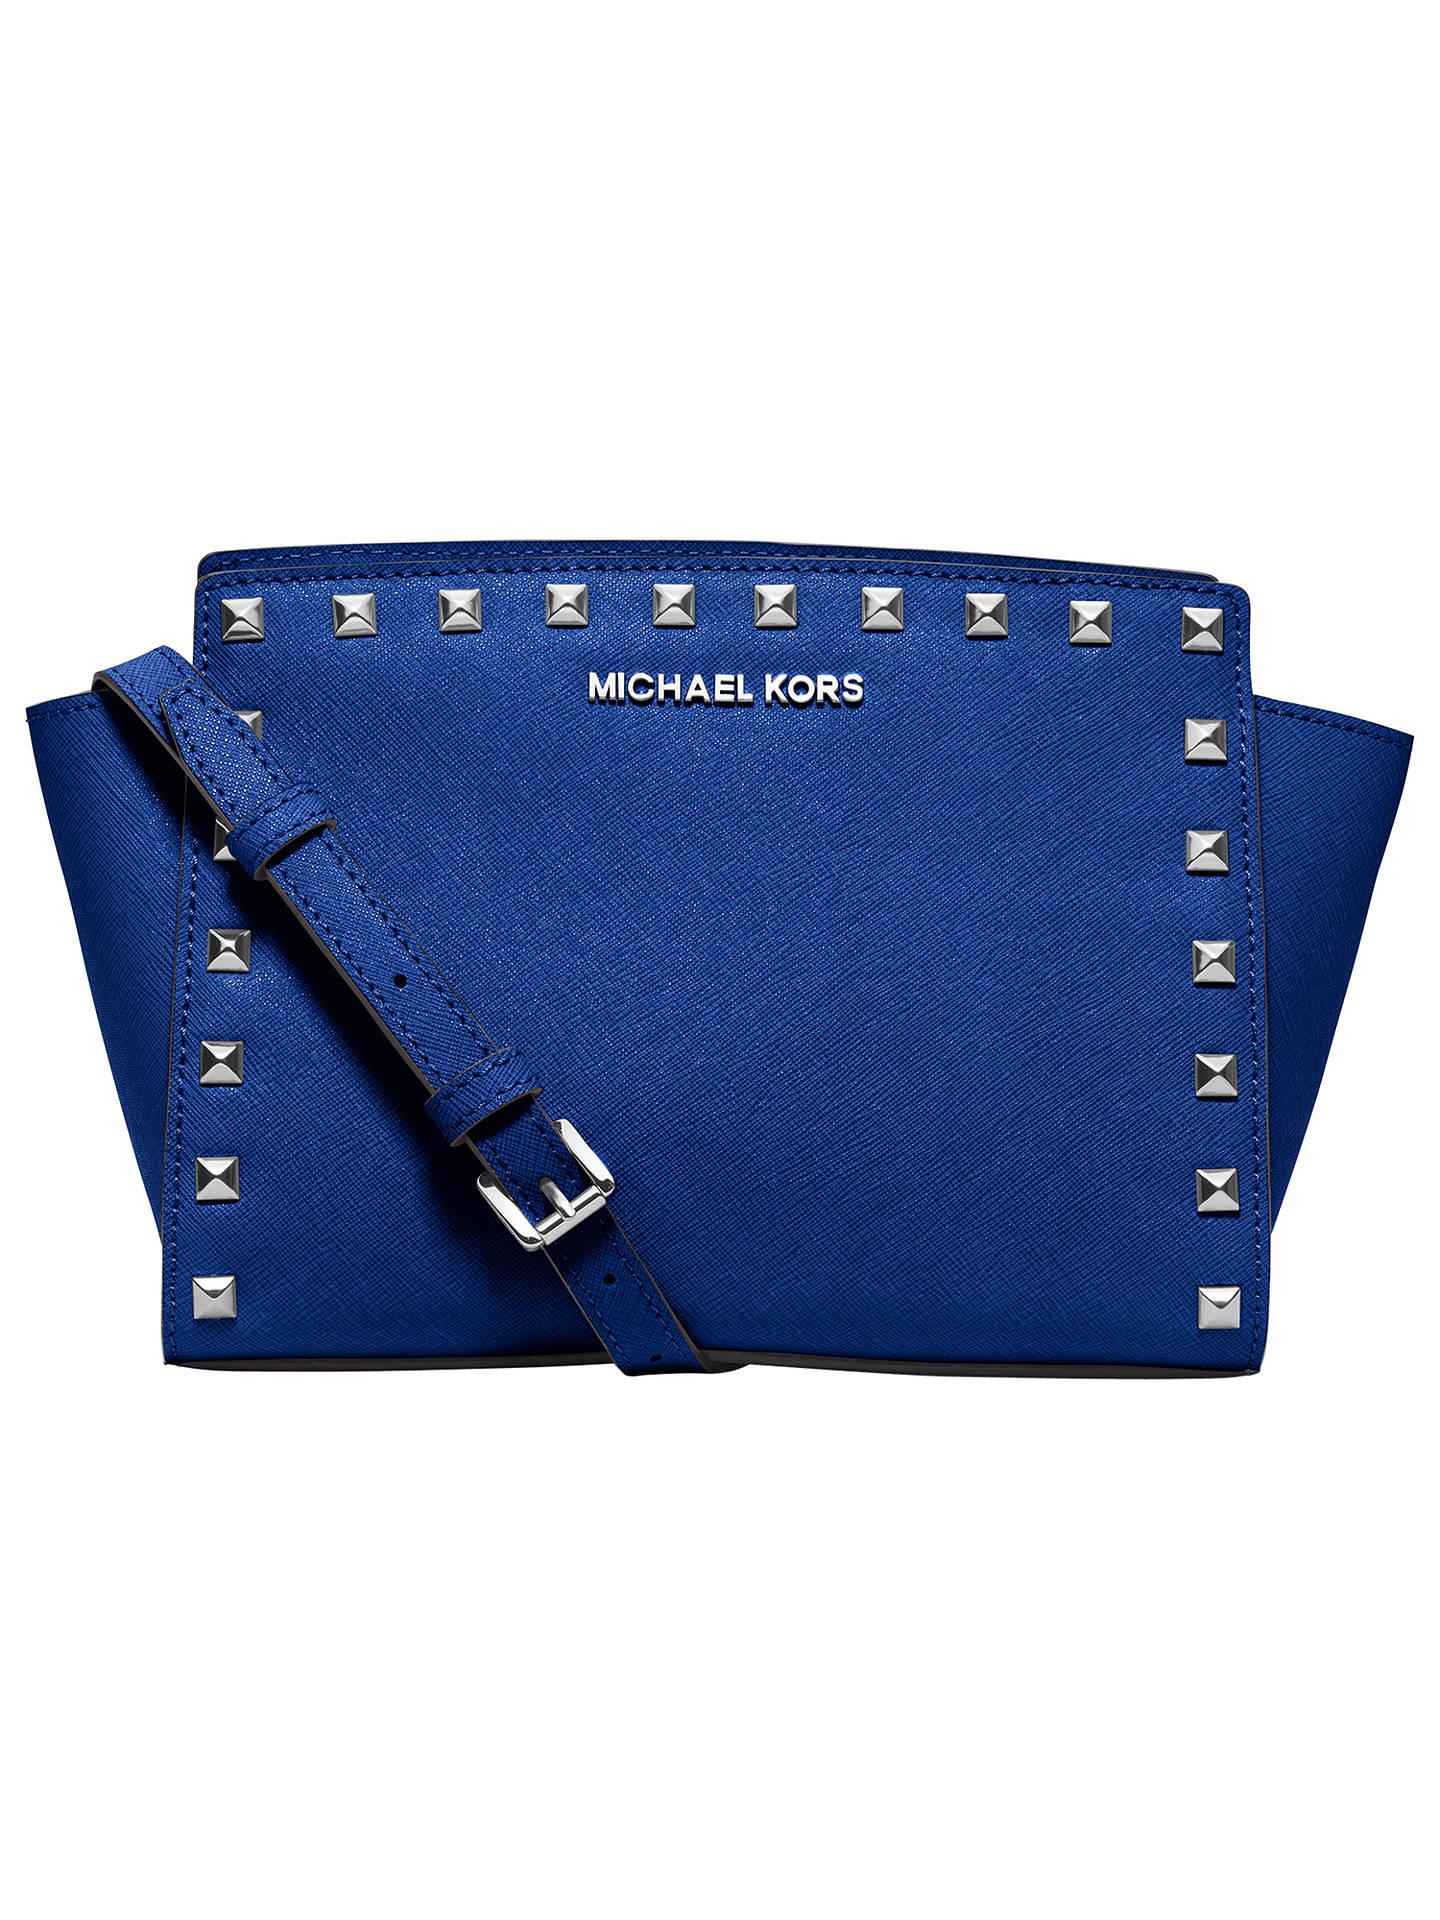 5b4e5f912381 Buy MICHAEL Michael Kors Selma Stud Medium Leather Messenger Bag, Blue  Online at johnlewis.